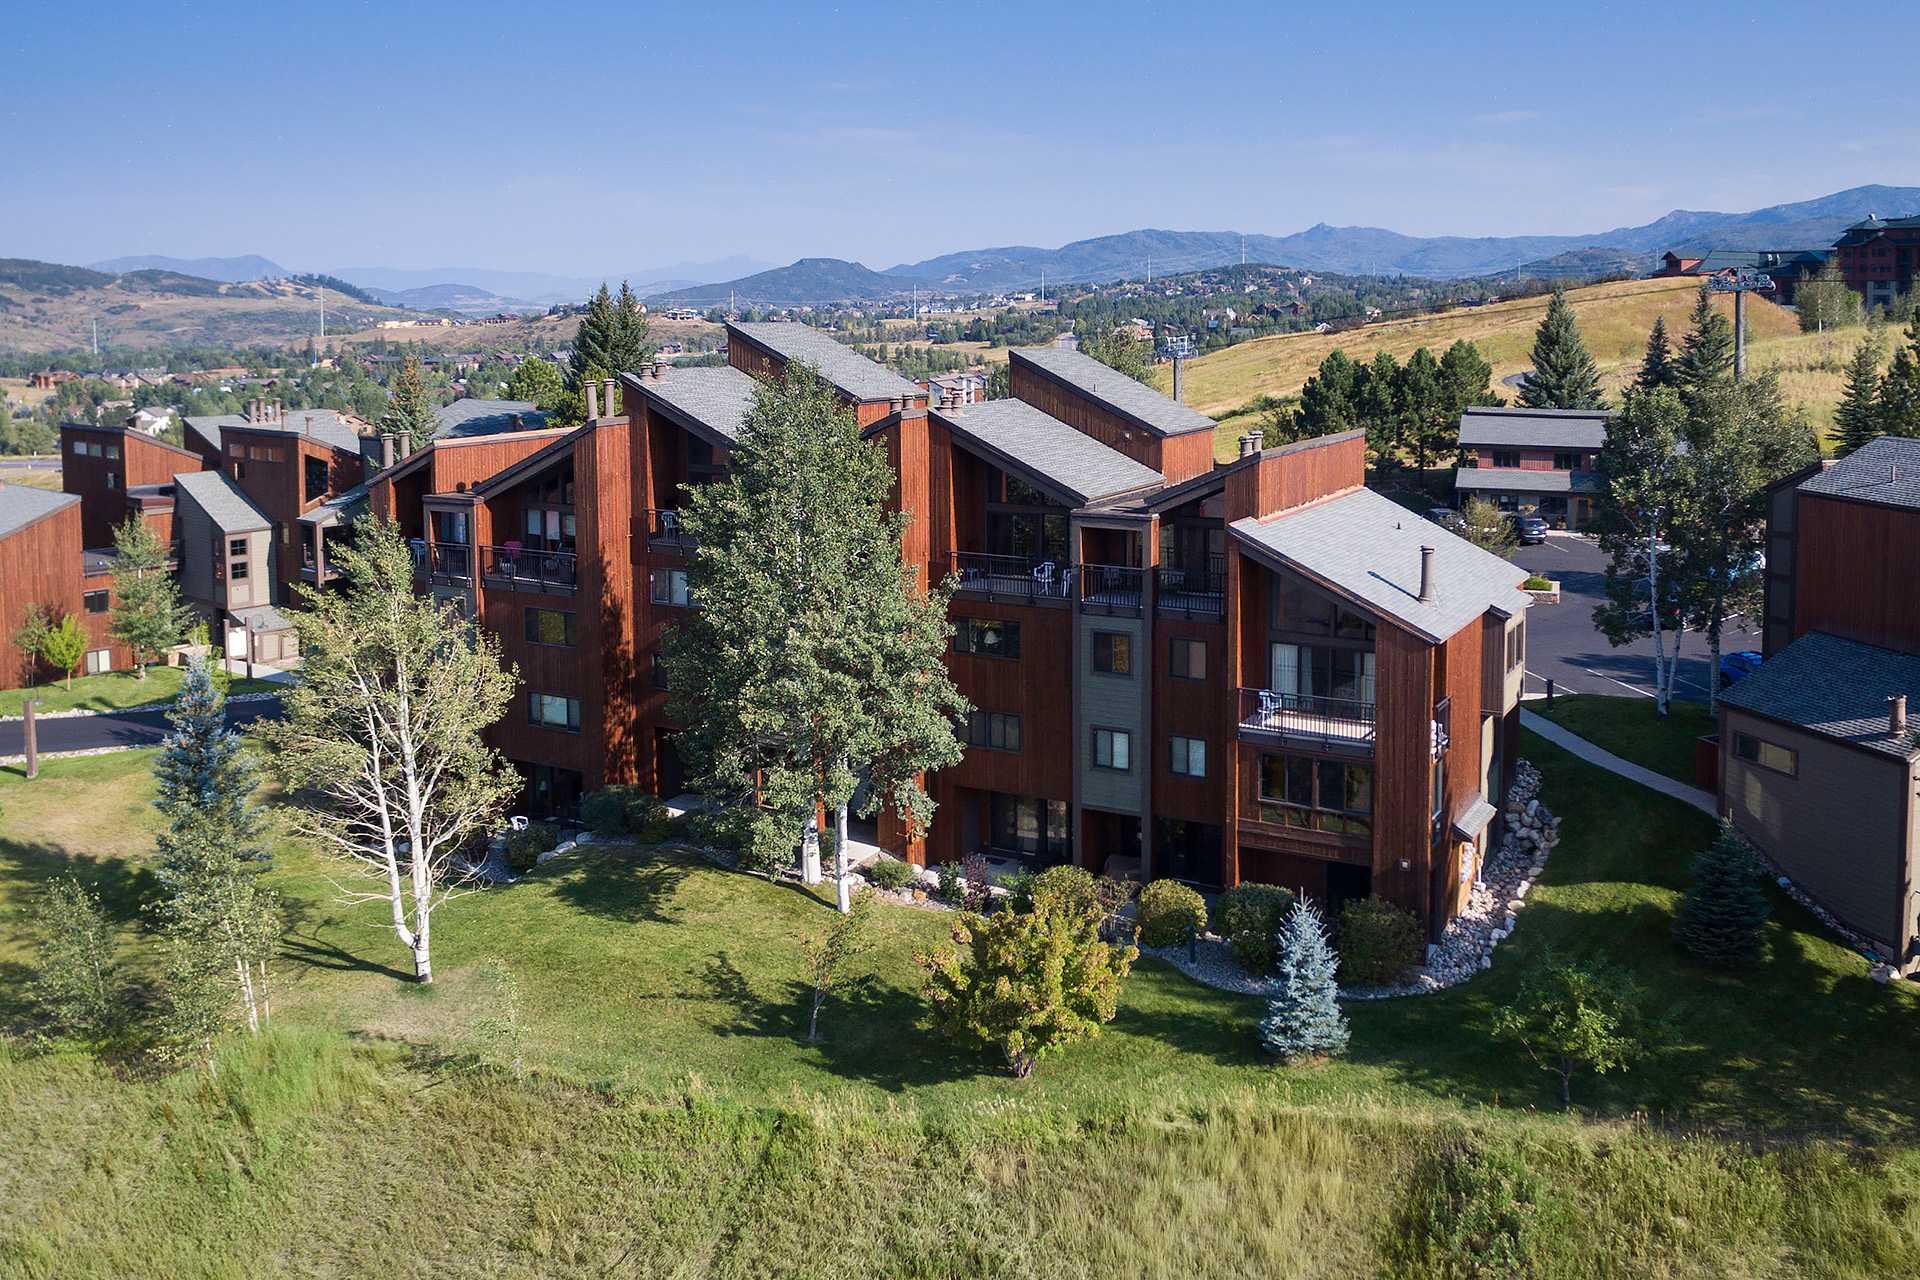 W3302: The West Condominiums